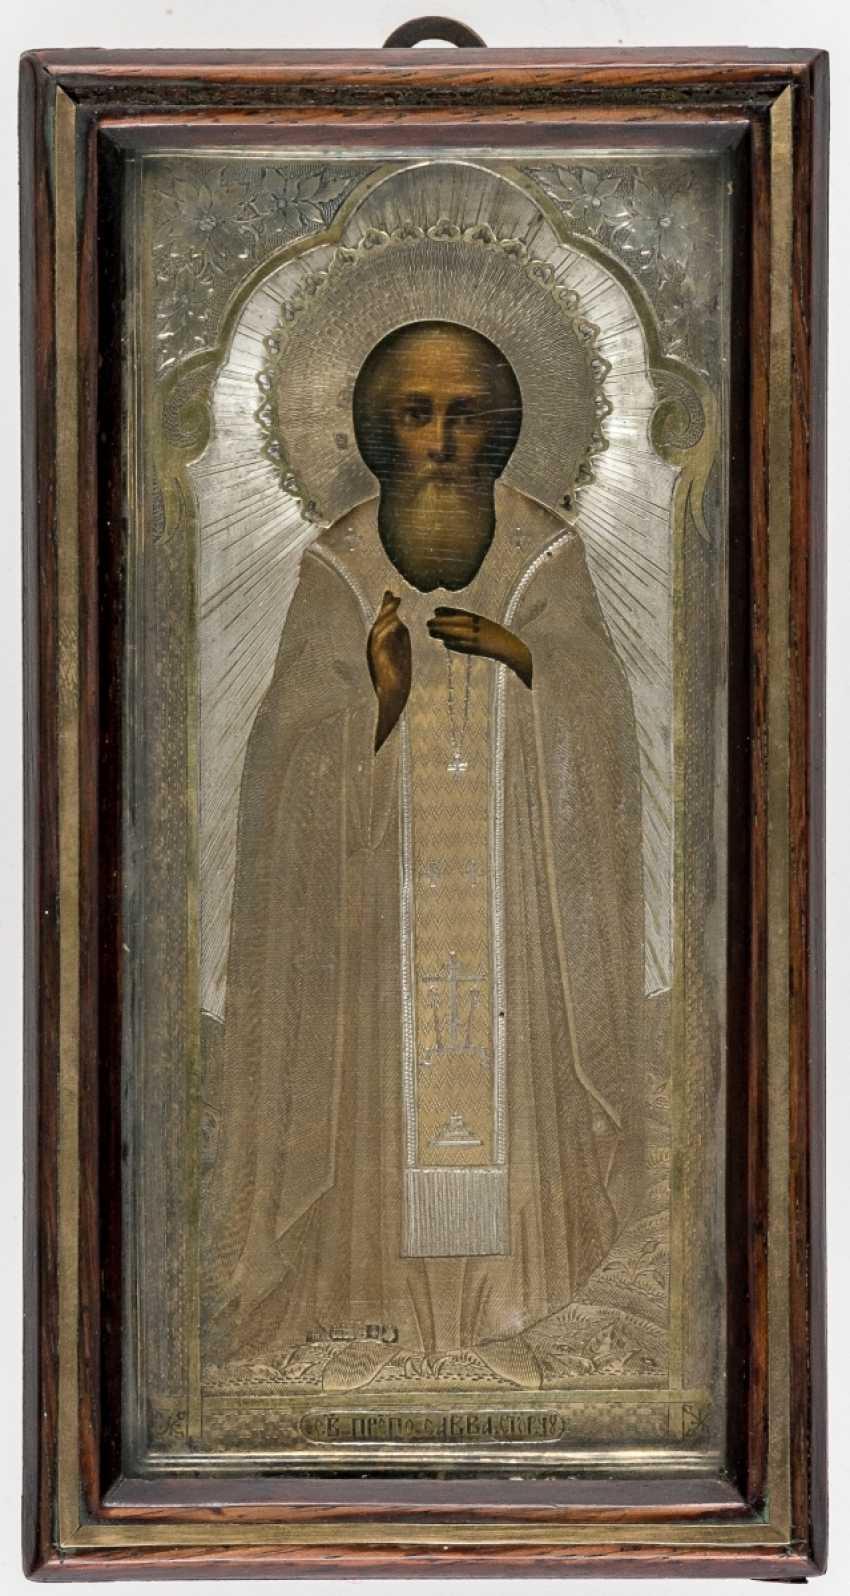 Small icon of St. Sergius of Radonezh in the icon case - photo 1